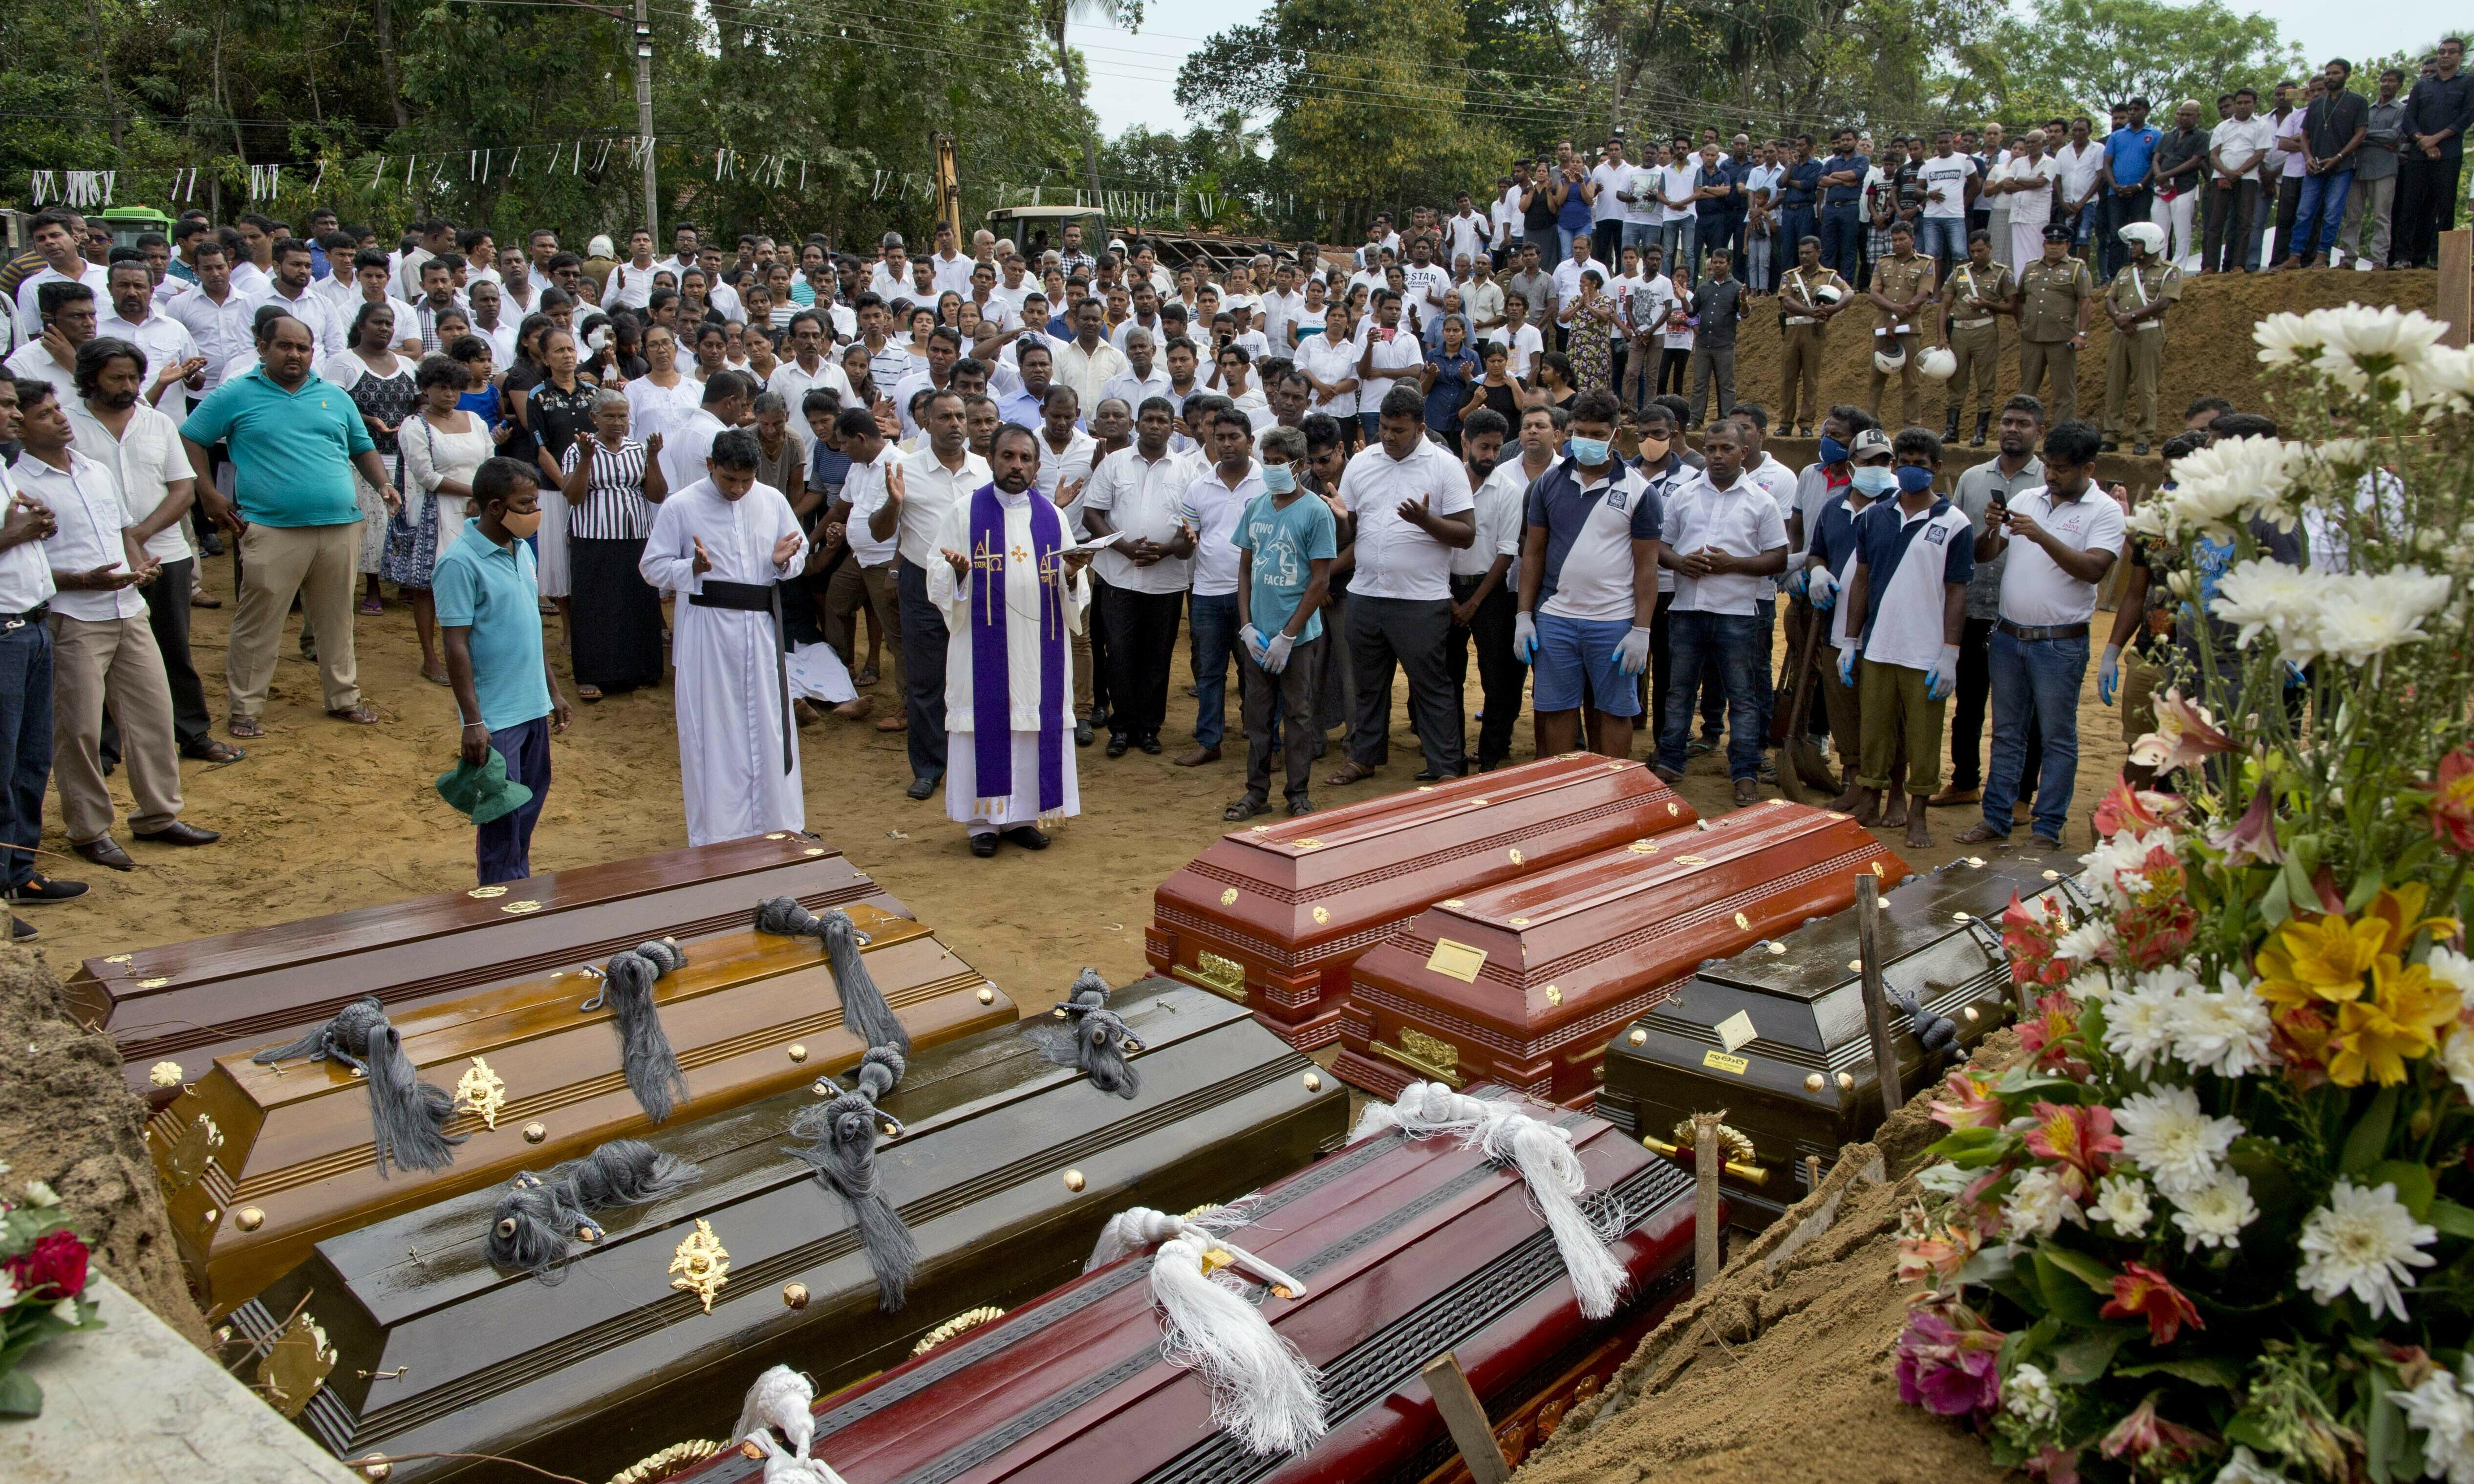 Sri Lanka attacker studied in UK and Australia, says minister